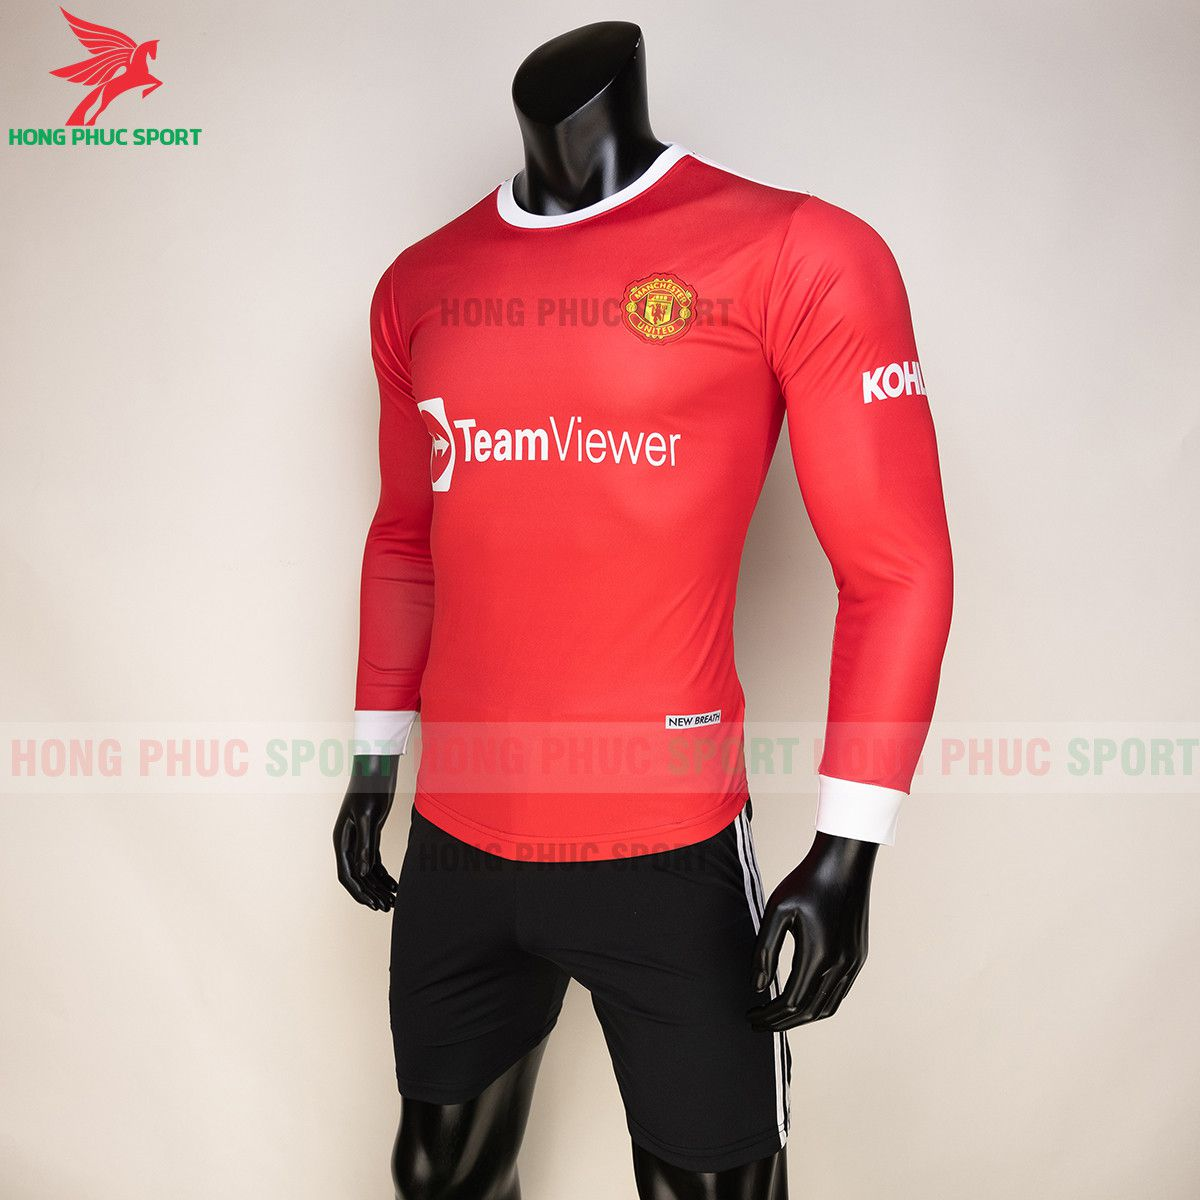 https://cdn.hongphucsport.com/unsafe/s4.shopbay.vn/files/285/ao-bong-da-tay-dai-man-utd-2021-22-san-nha-thun-lanh-4-61557fd1b4a5c.jpg